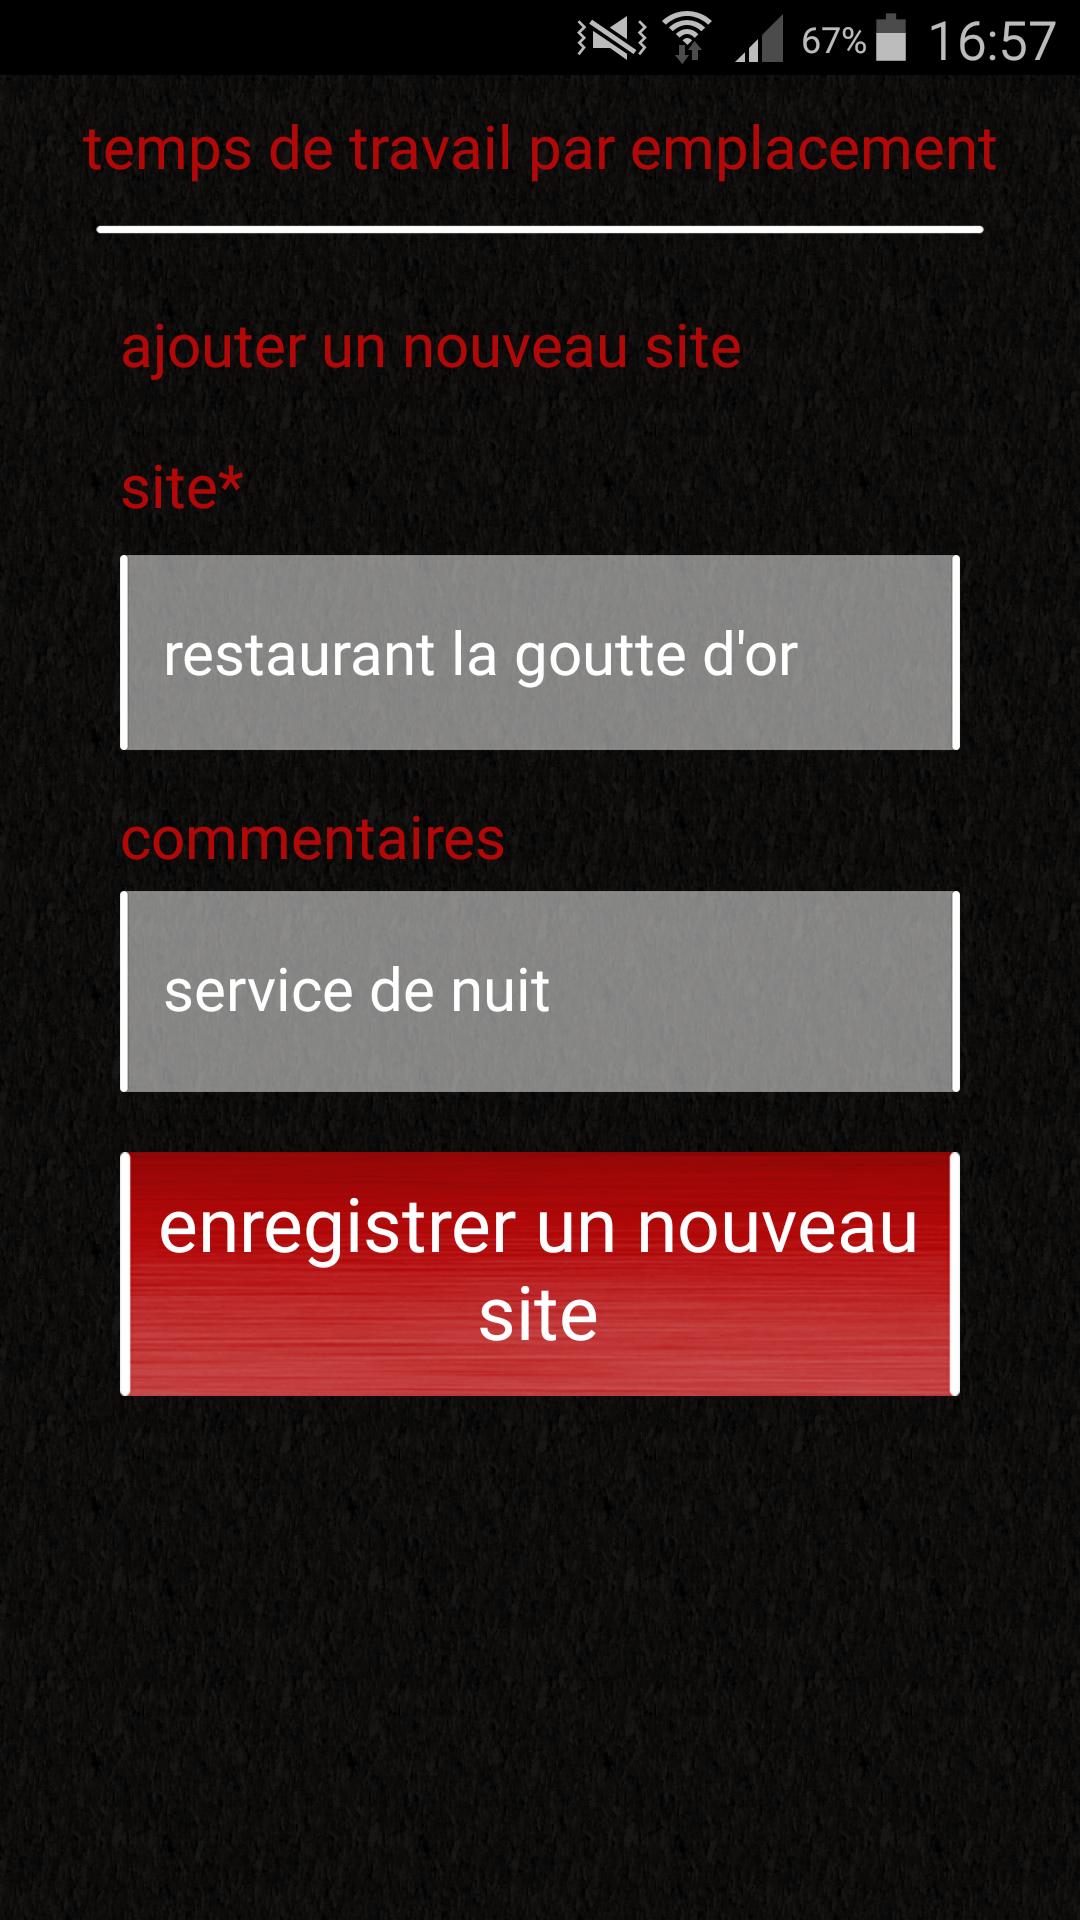 ginstr_app_labourTimePerLocation_FR_6